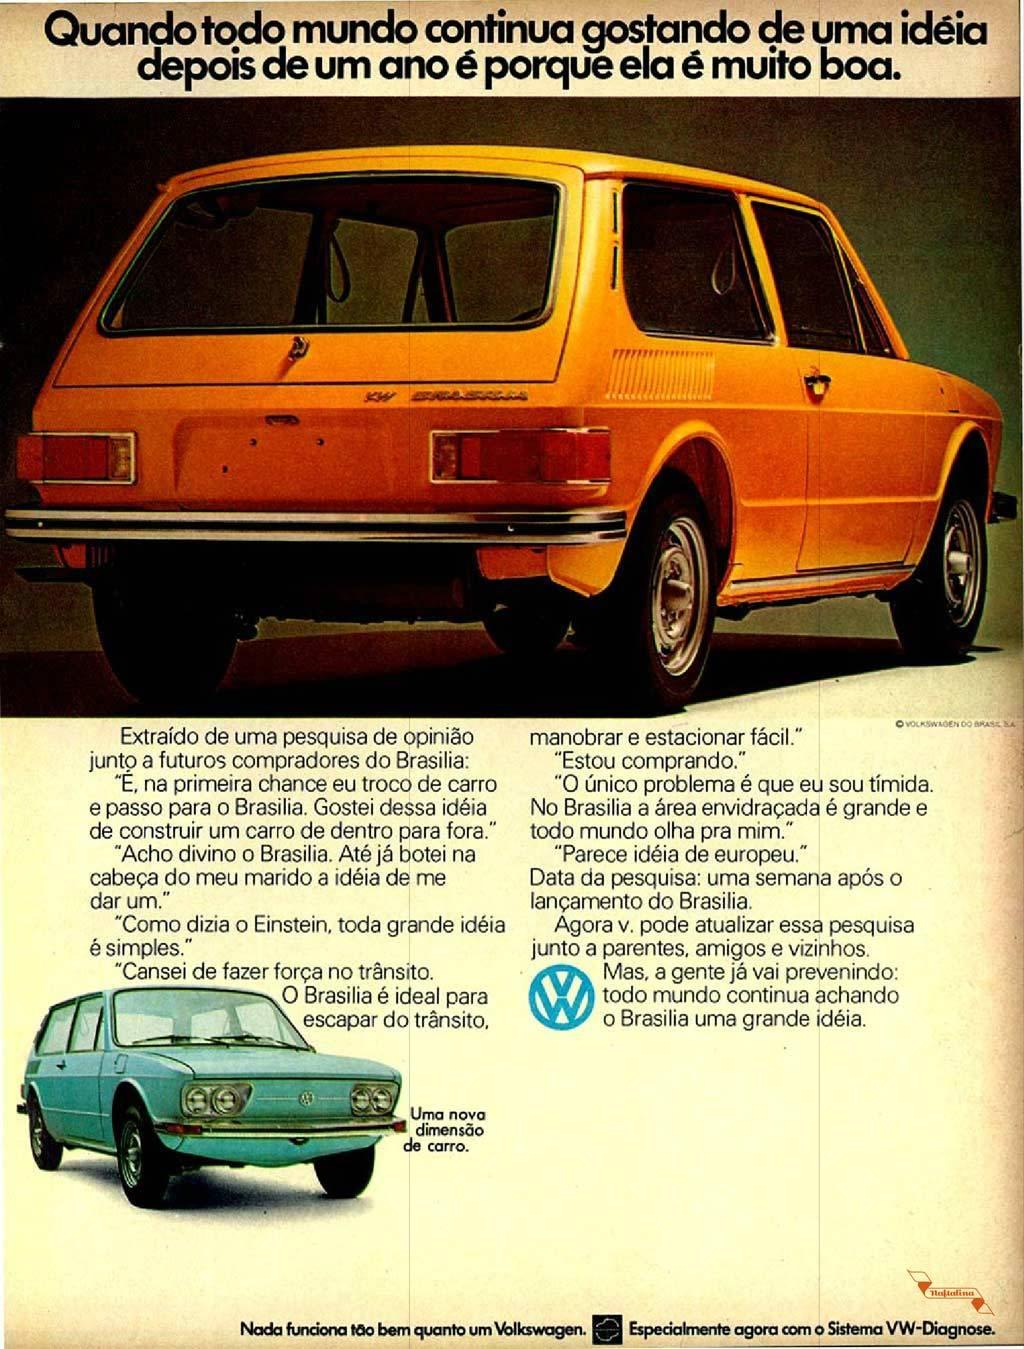 Propaganda antiga da Volkswagen apresentando as vantagens de ter uma Brasília, em 1974